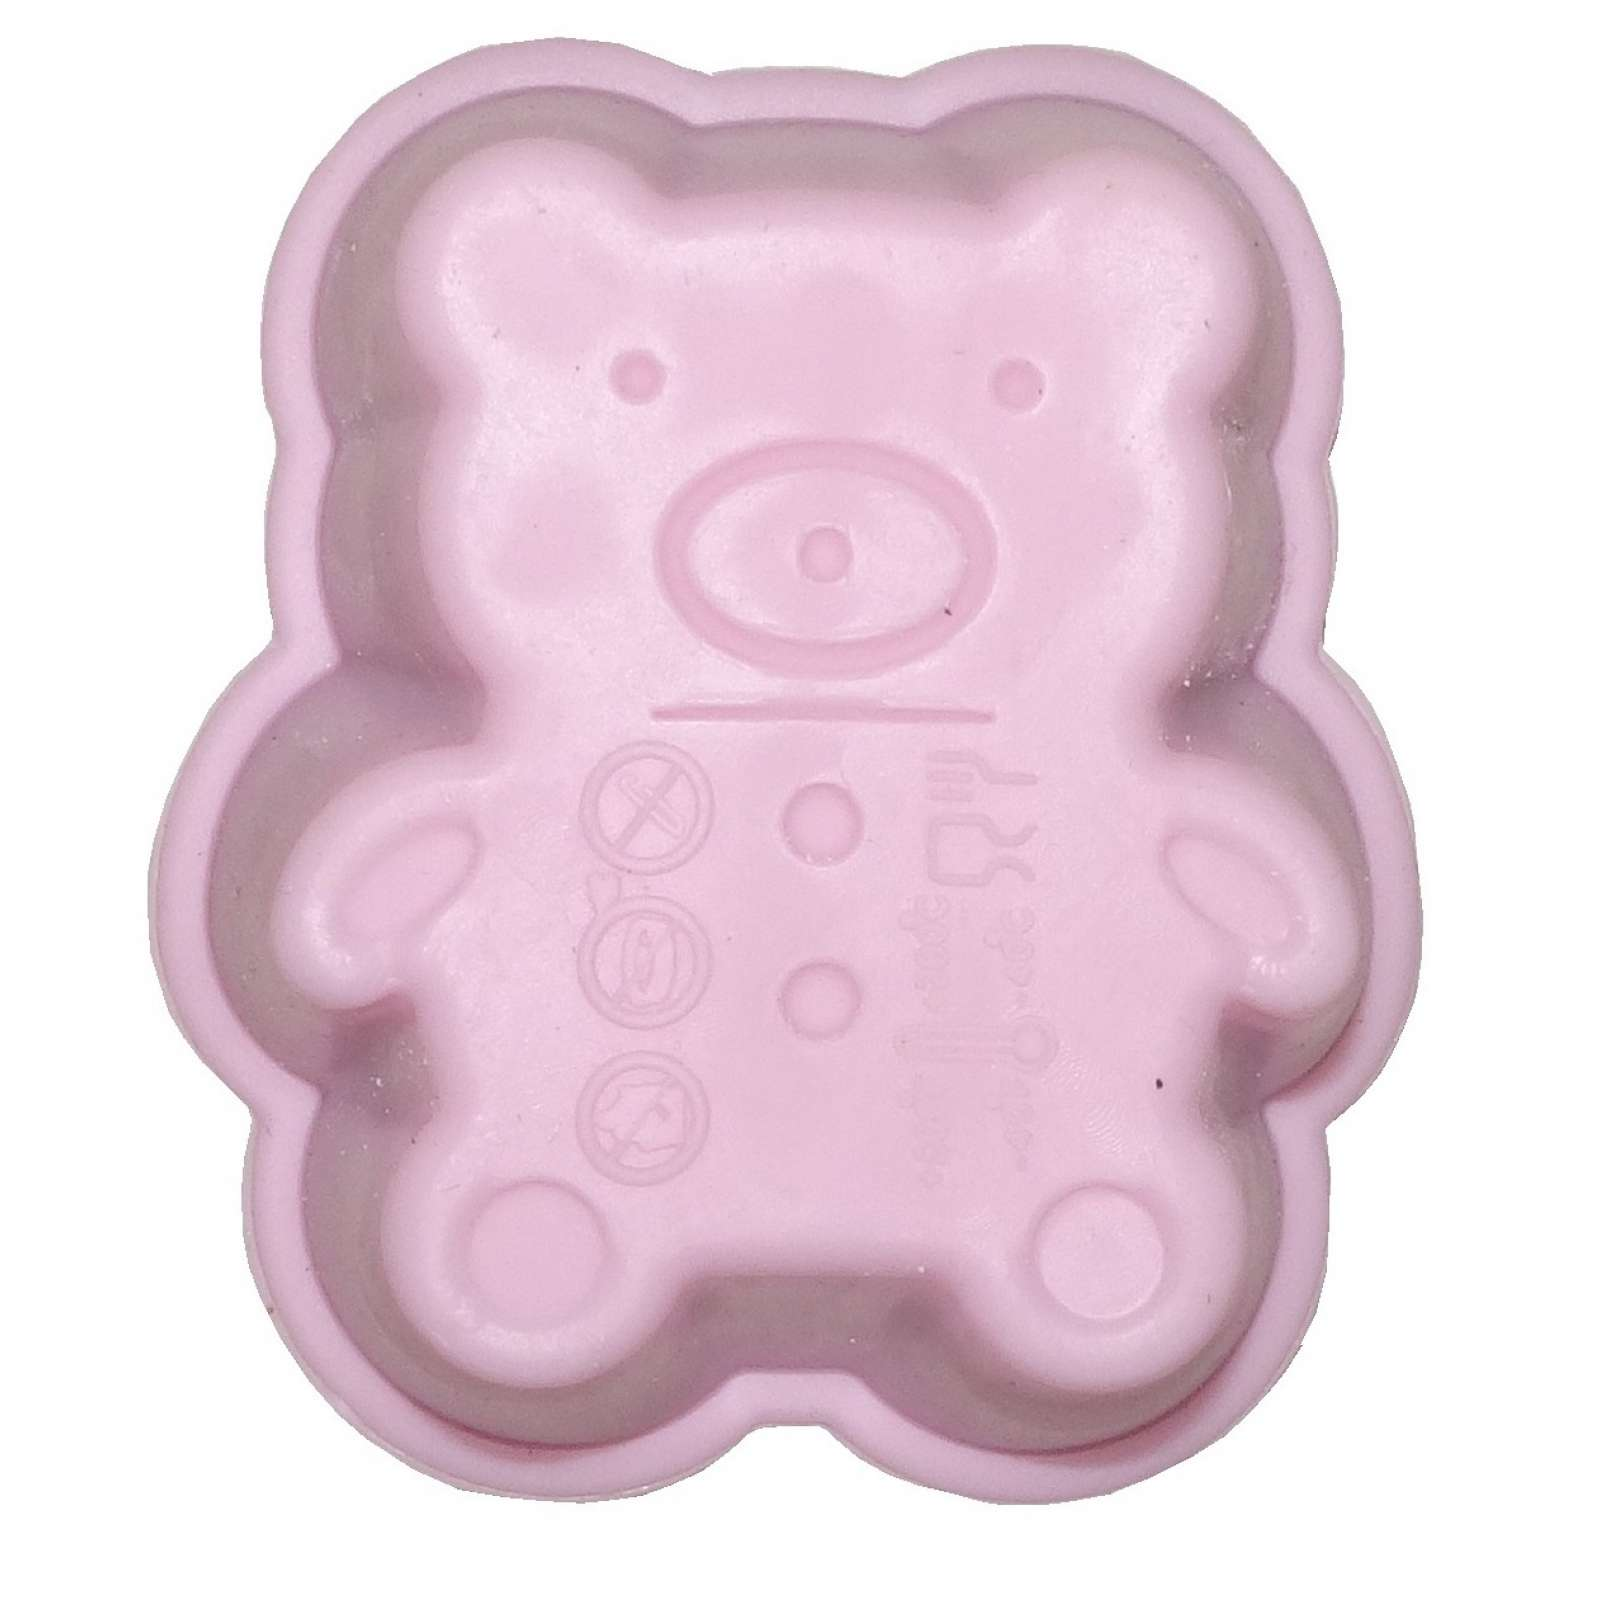 6er set Silikon Muffin Backform pink Cupcake